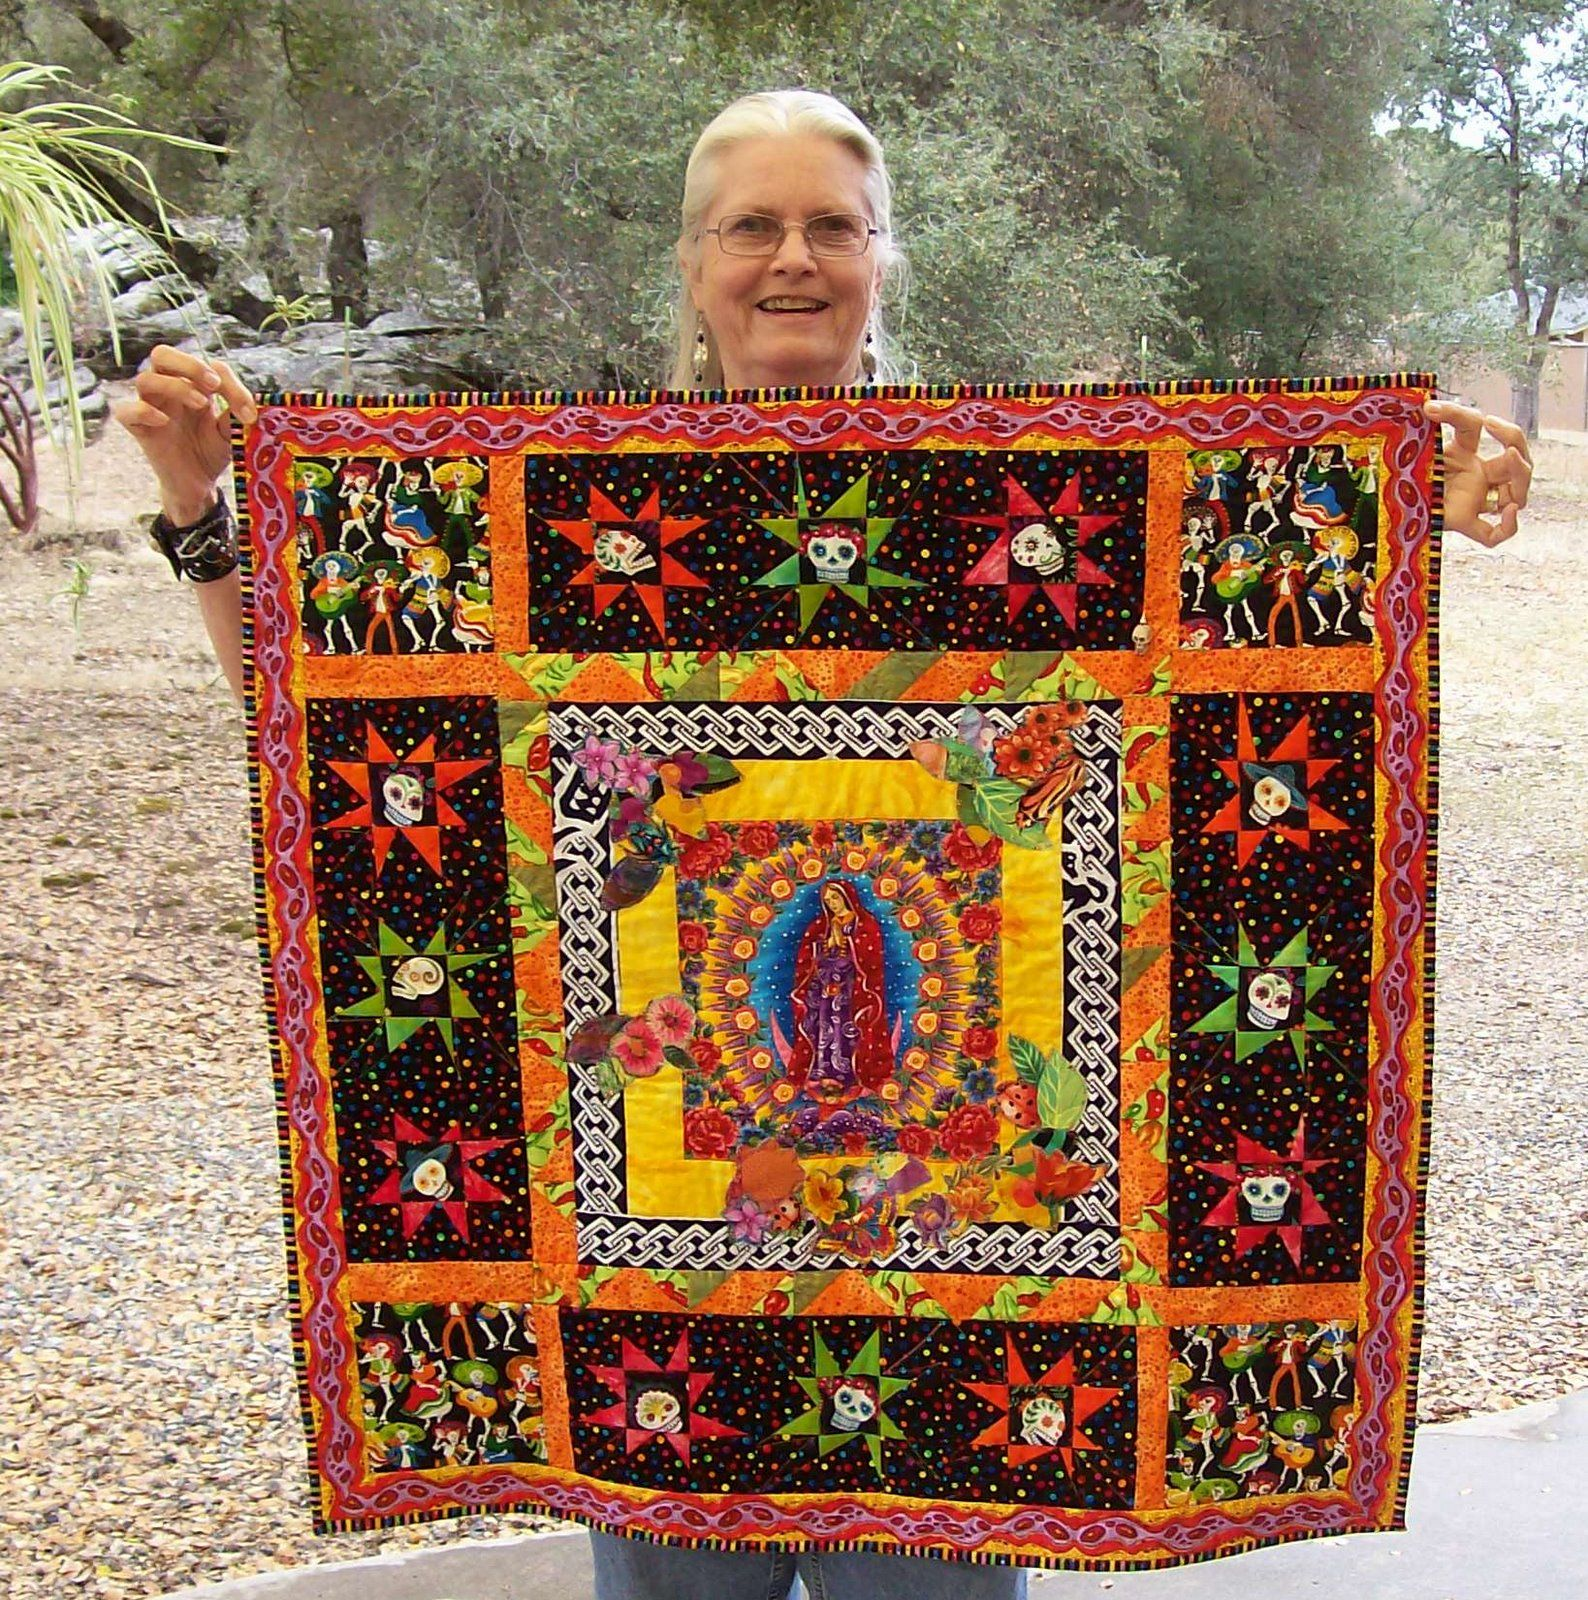 Vivian Helena Creates: Yoyo Challenge, Day of the Dead Quilt ... : day of the dead quilt pattern - Adamdwight.com